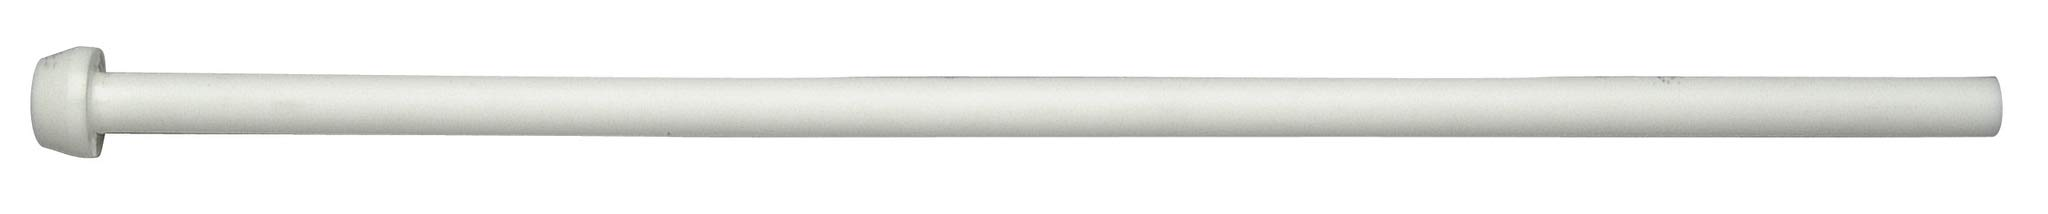 Zurn QCL15X Closet Supply Tube, PEX, 3/8'' OD, 15'' Length, Plastic (Pack of 100)